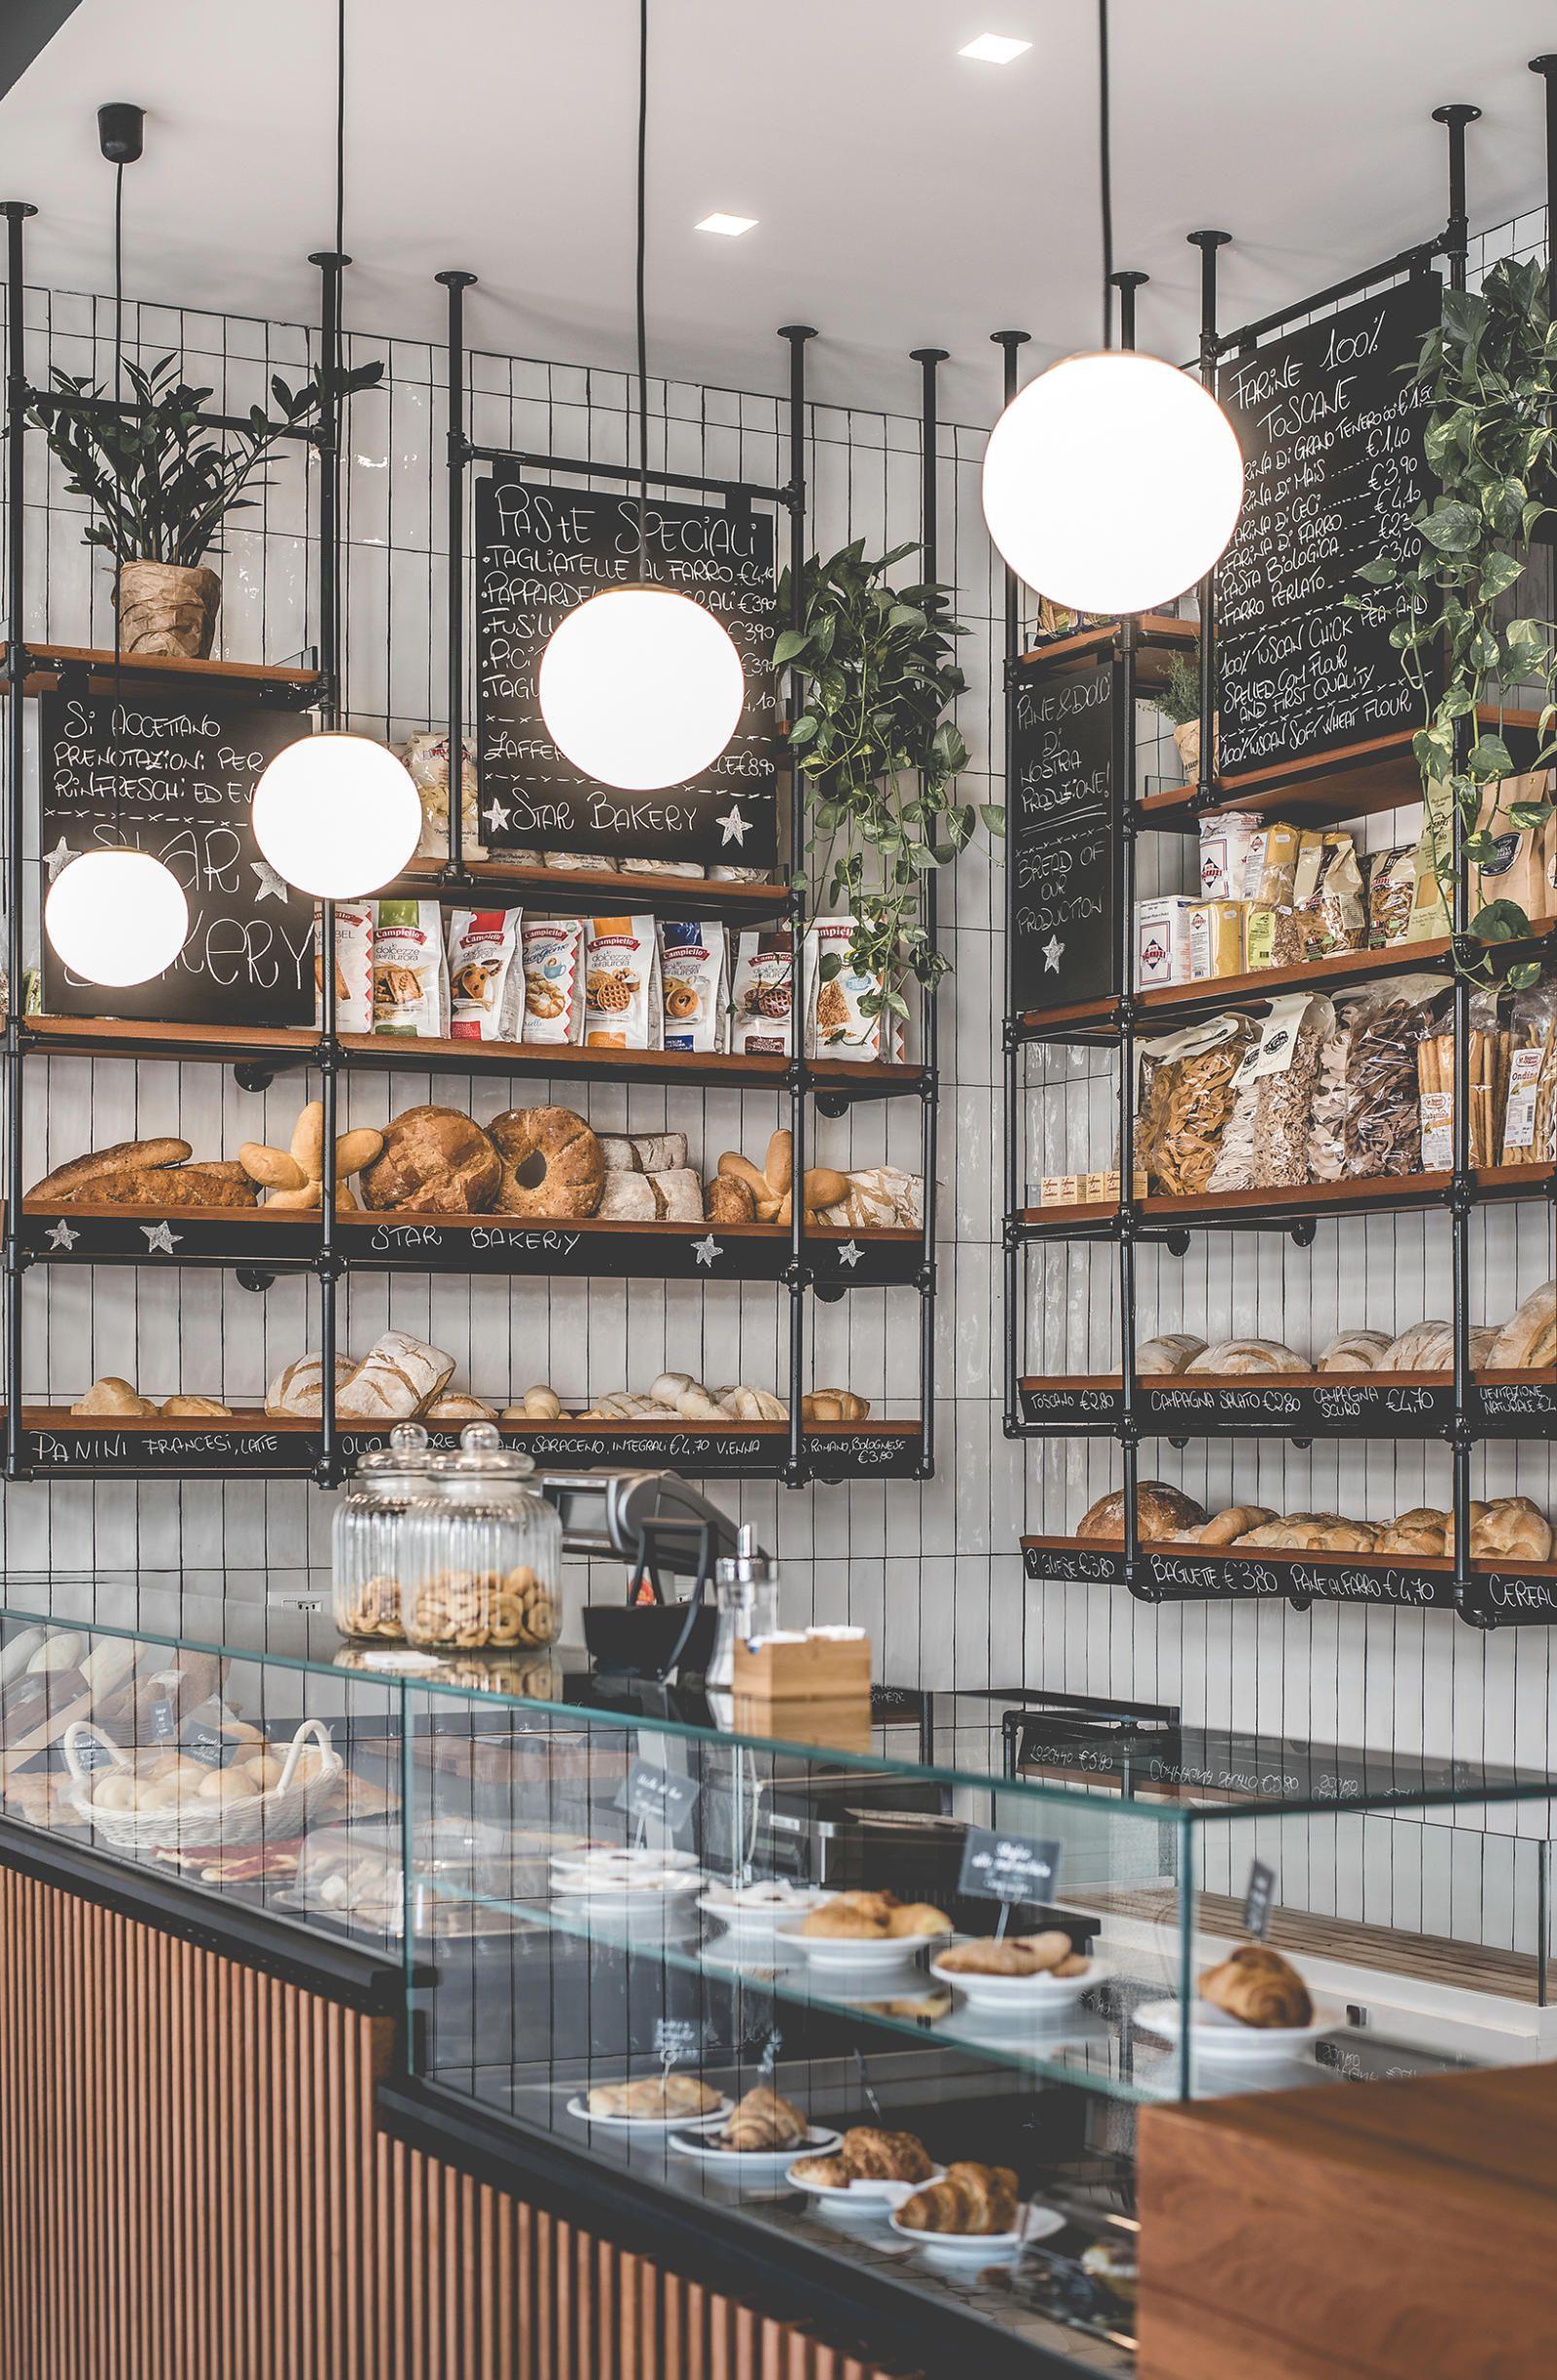 Architettura And Design star bakery by modo architettura + design baked goods